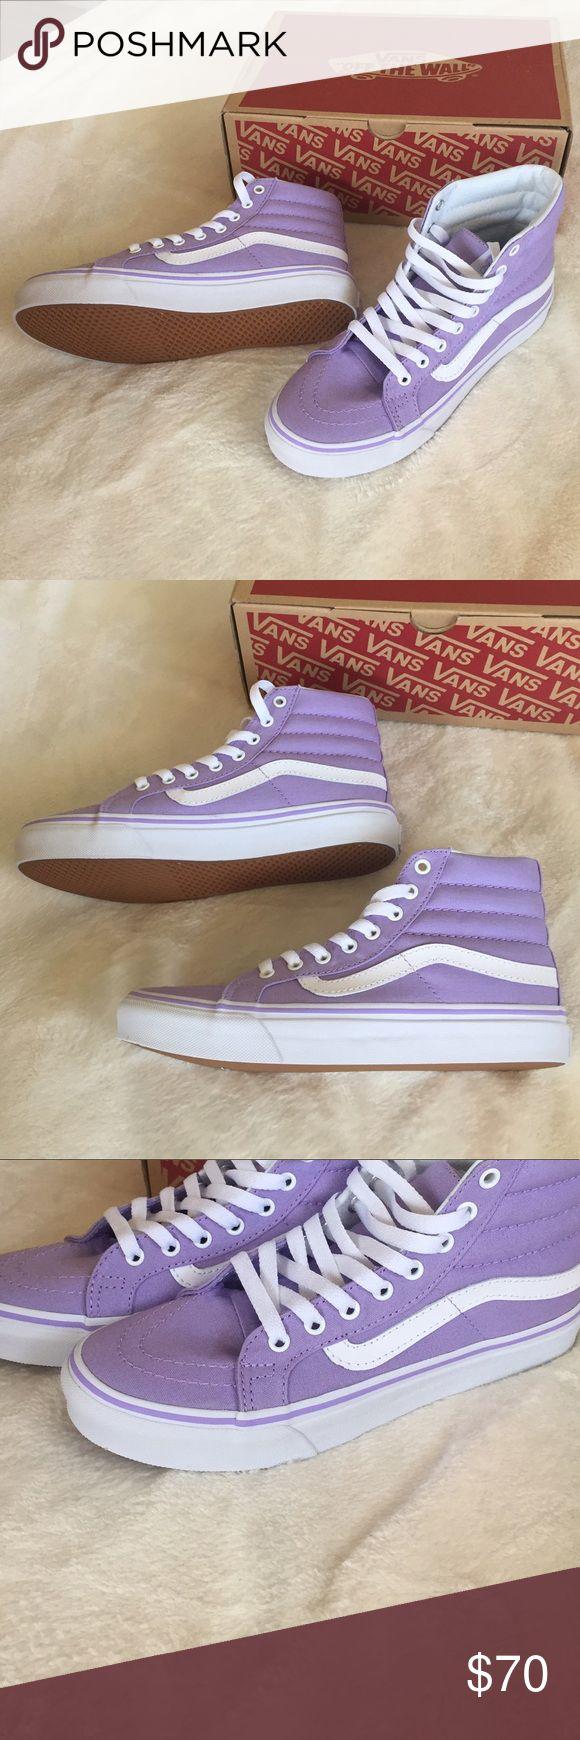 Sk8-Hi pastel purple vans Size 6.5 in women and 5 in men •beautiful pastel color •amazing for summer Vans Shoes Sneakers